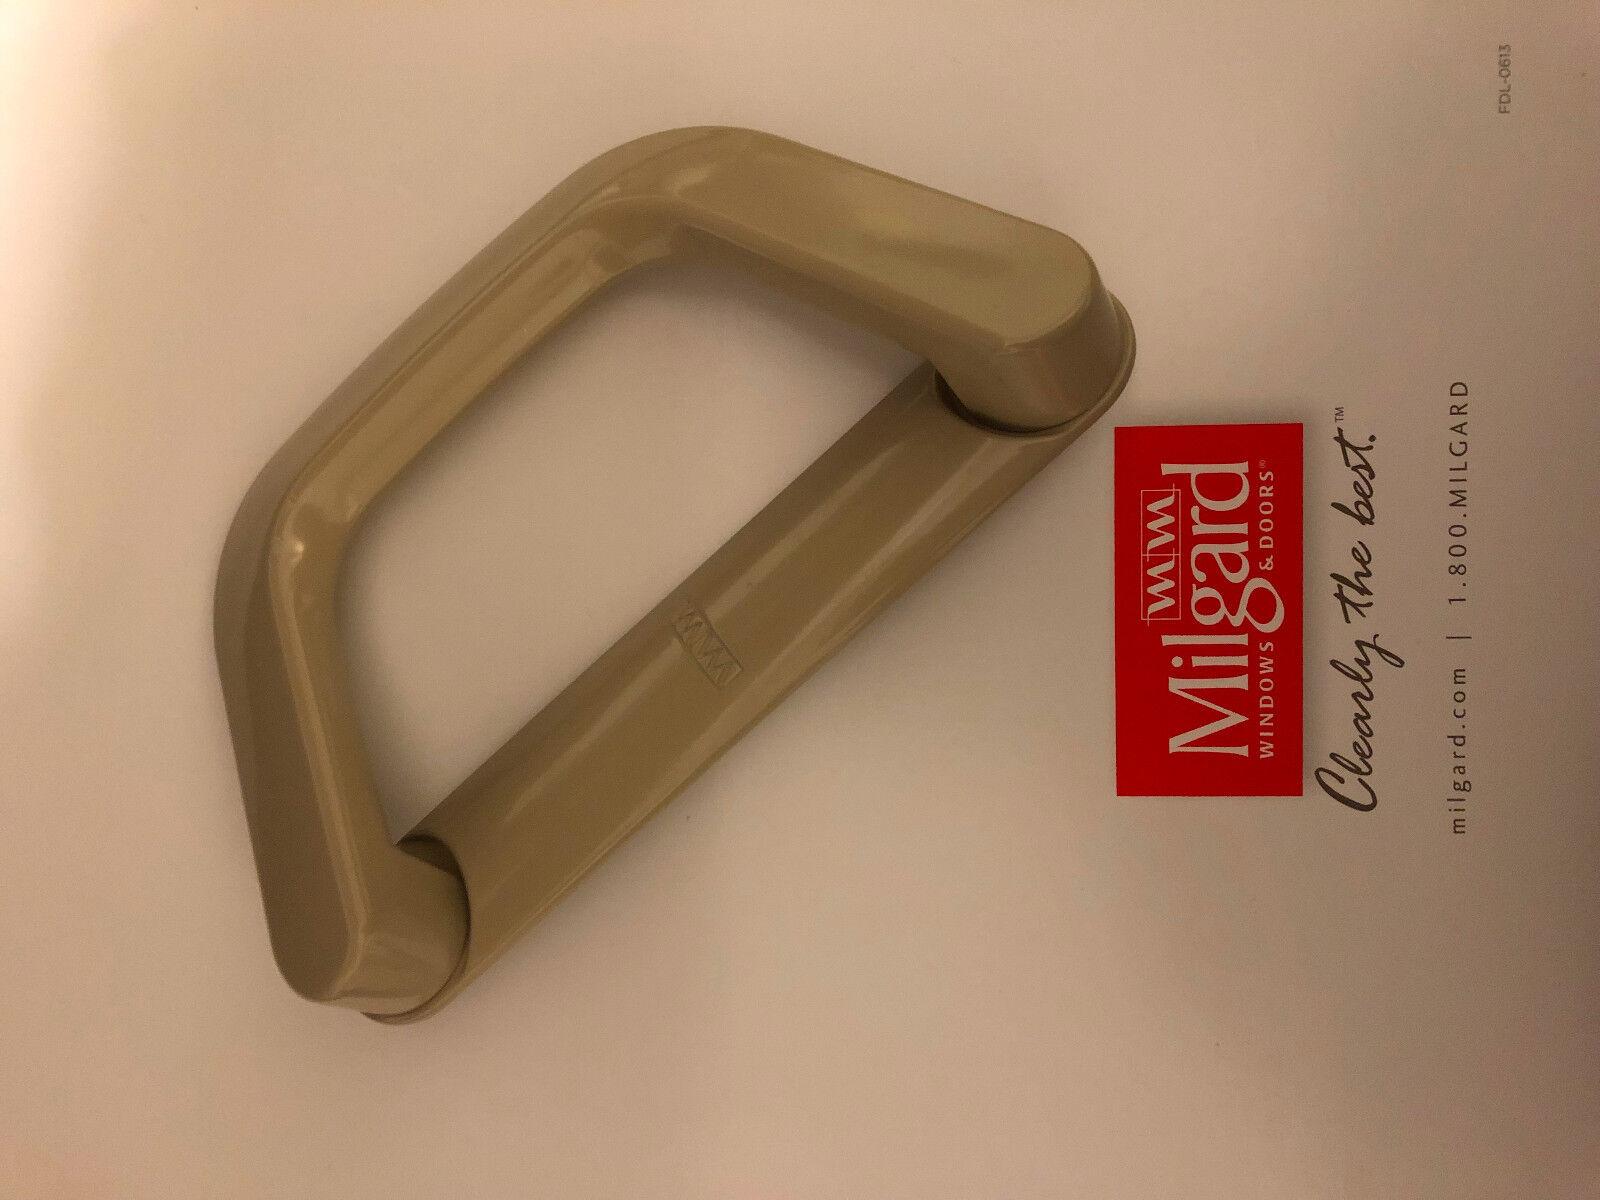 Milgard Sliding Door Handle set Classic Style D Handle Full Set TAN Color